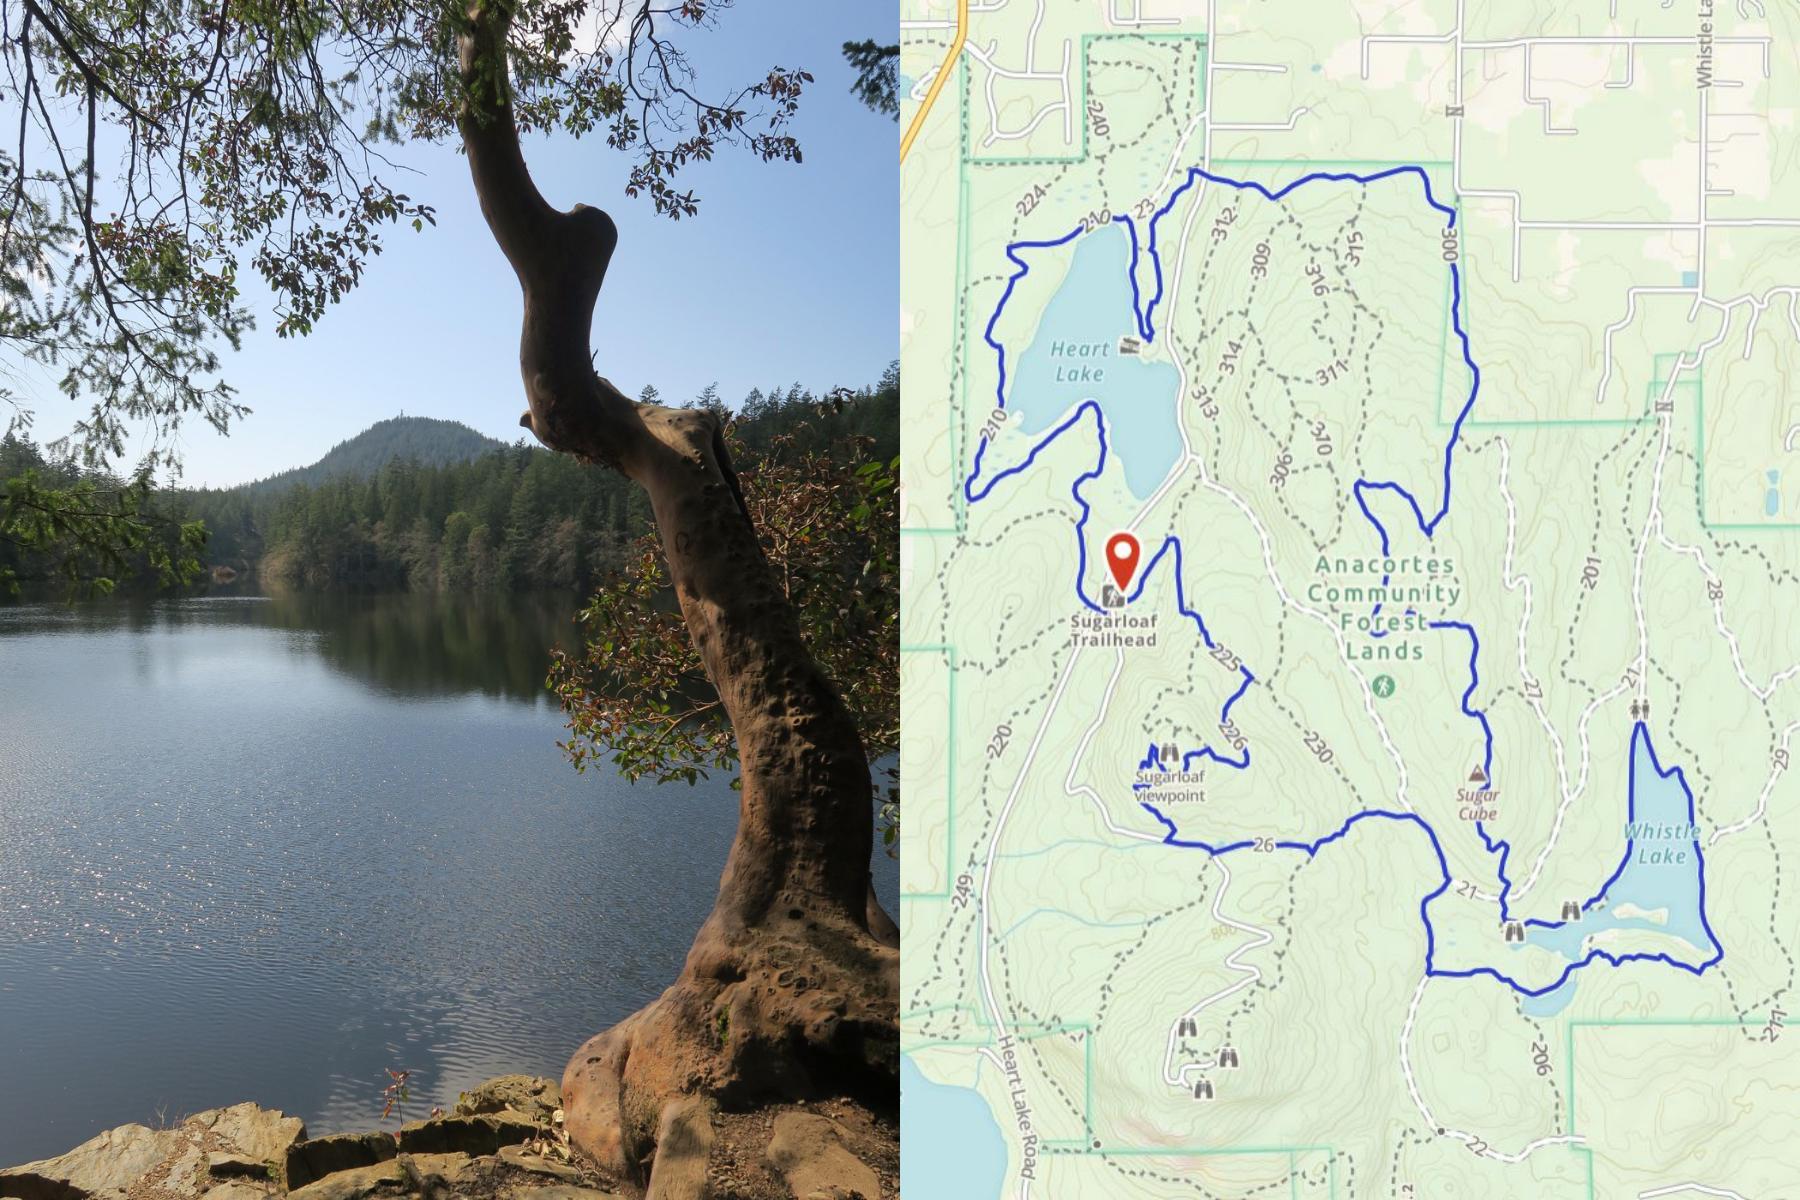 Anacortes Community Forest